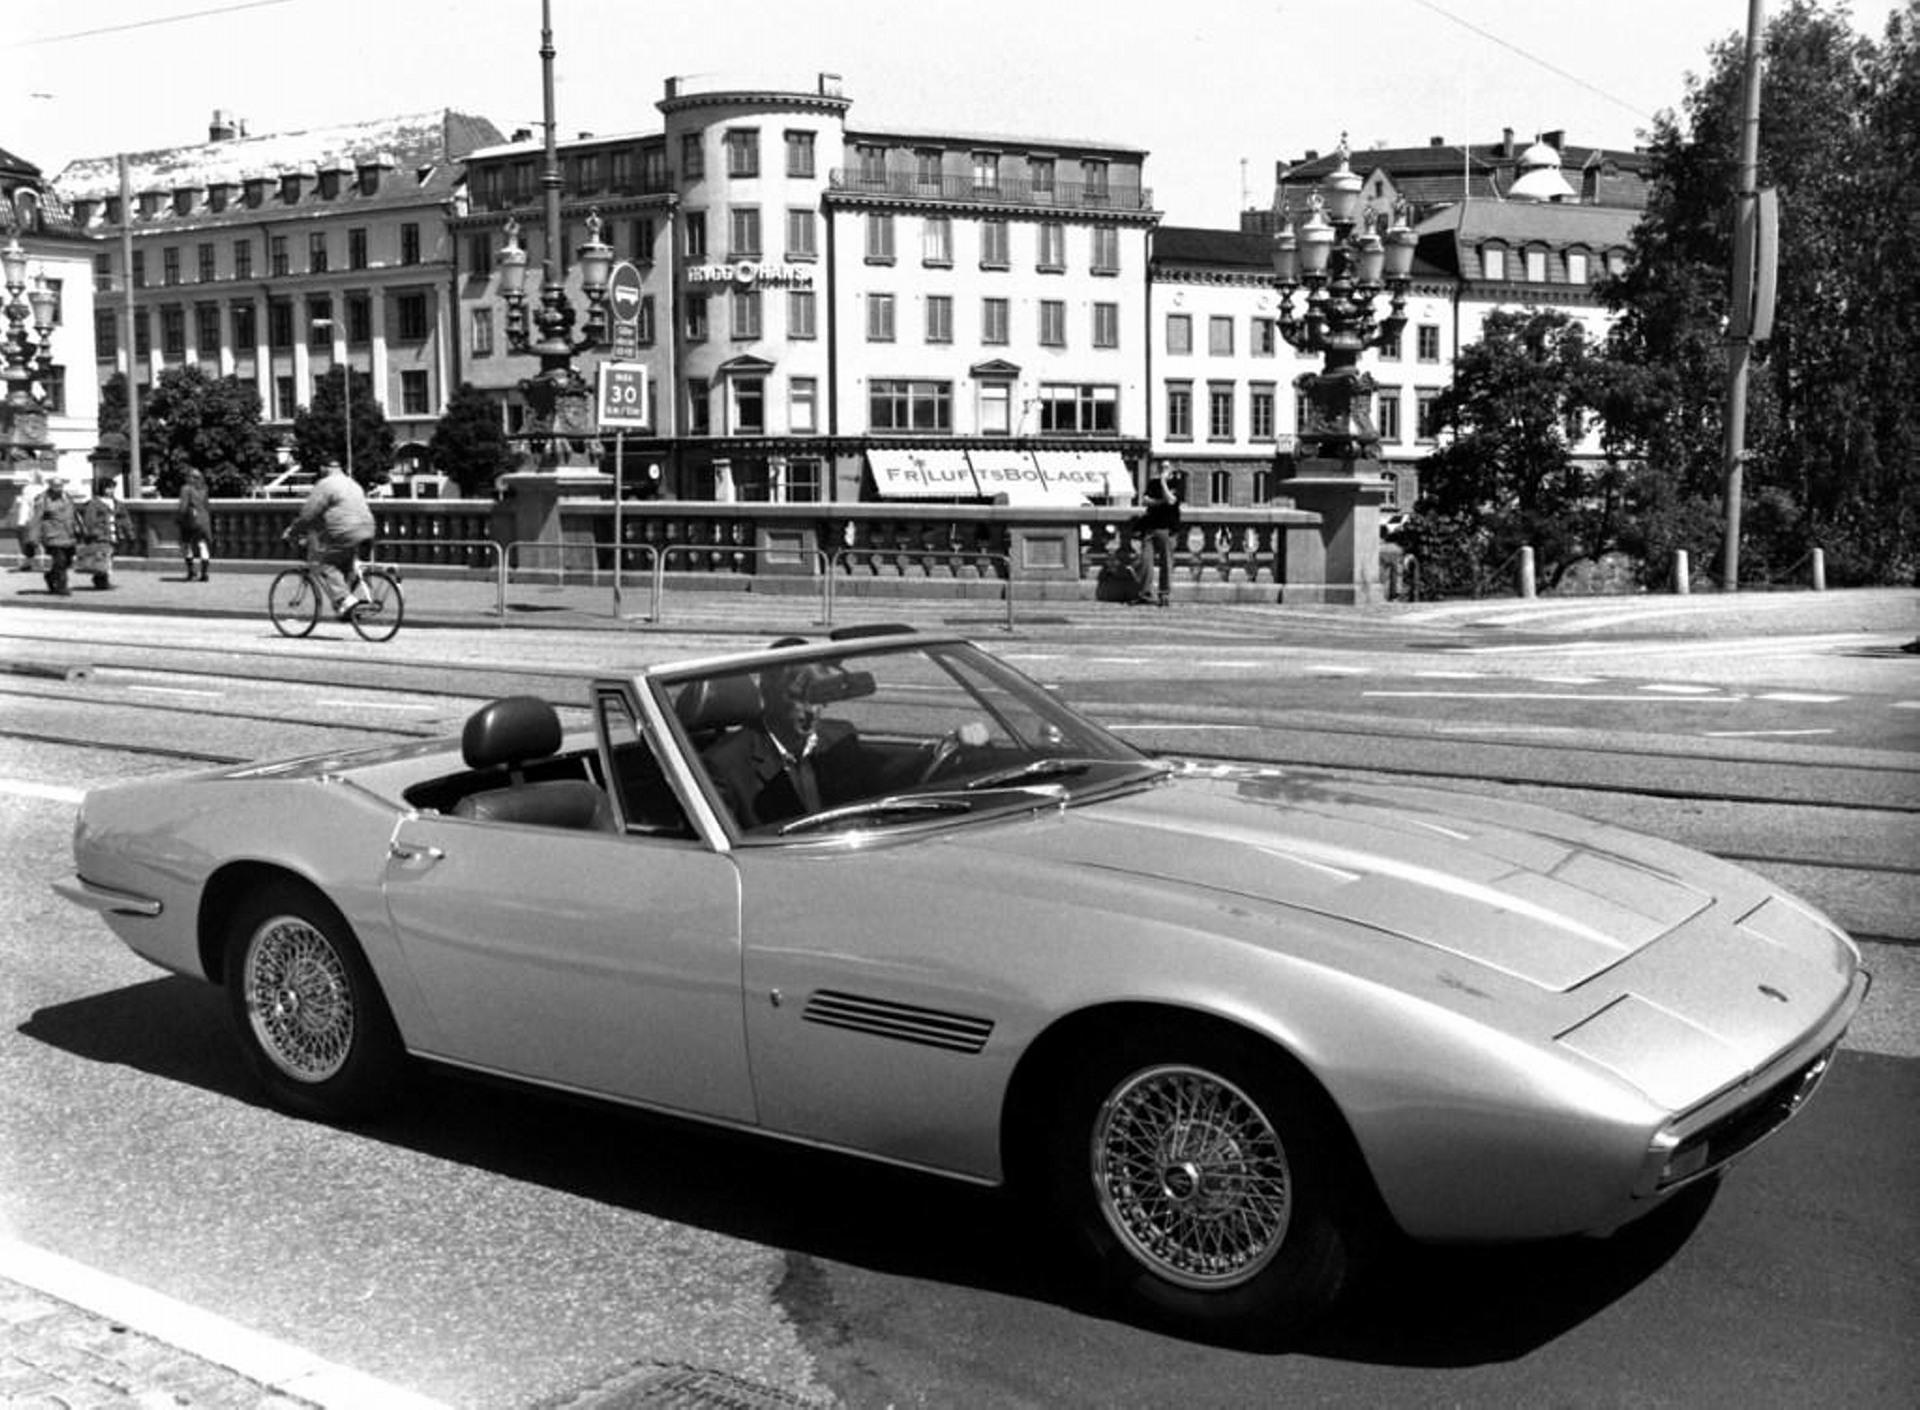 1969 Maserati Ghibli Image